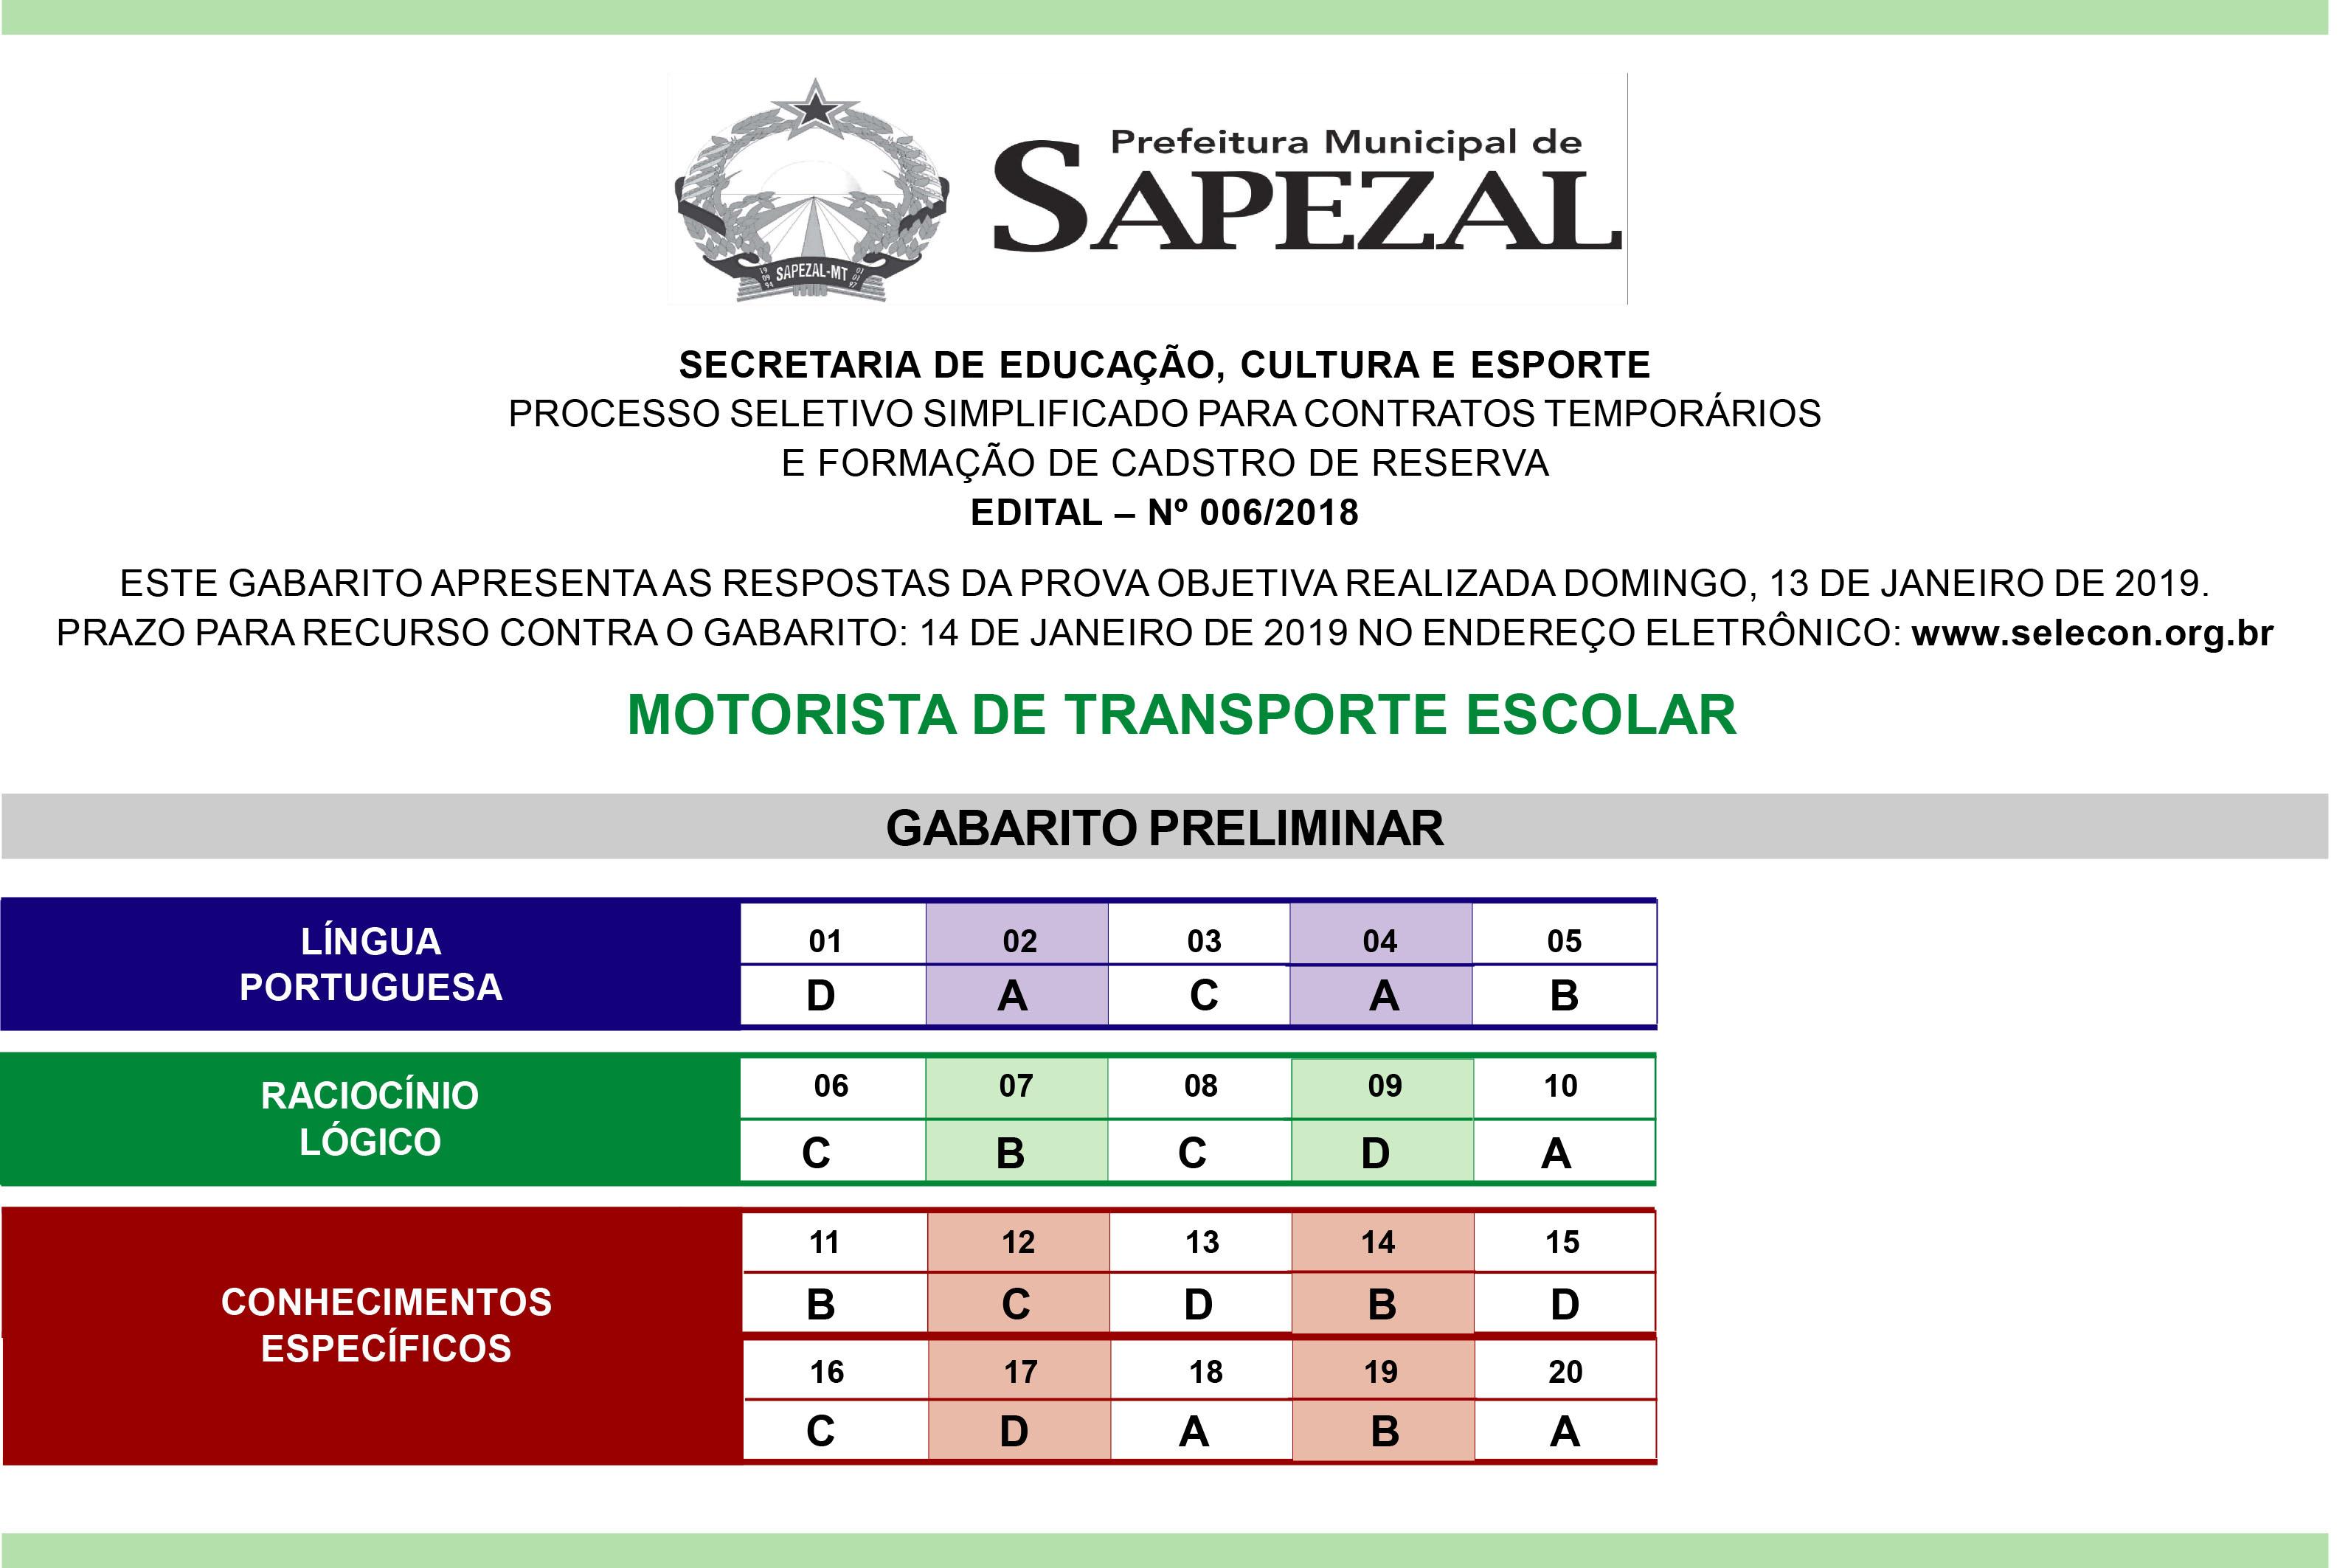 Gabarito_MOTORISTA_SAPEZAL